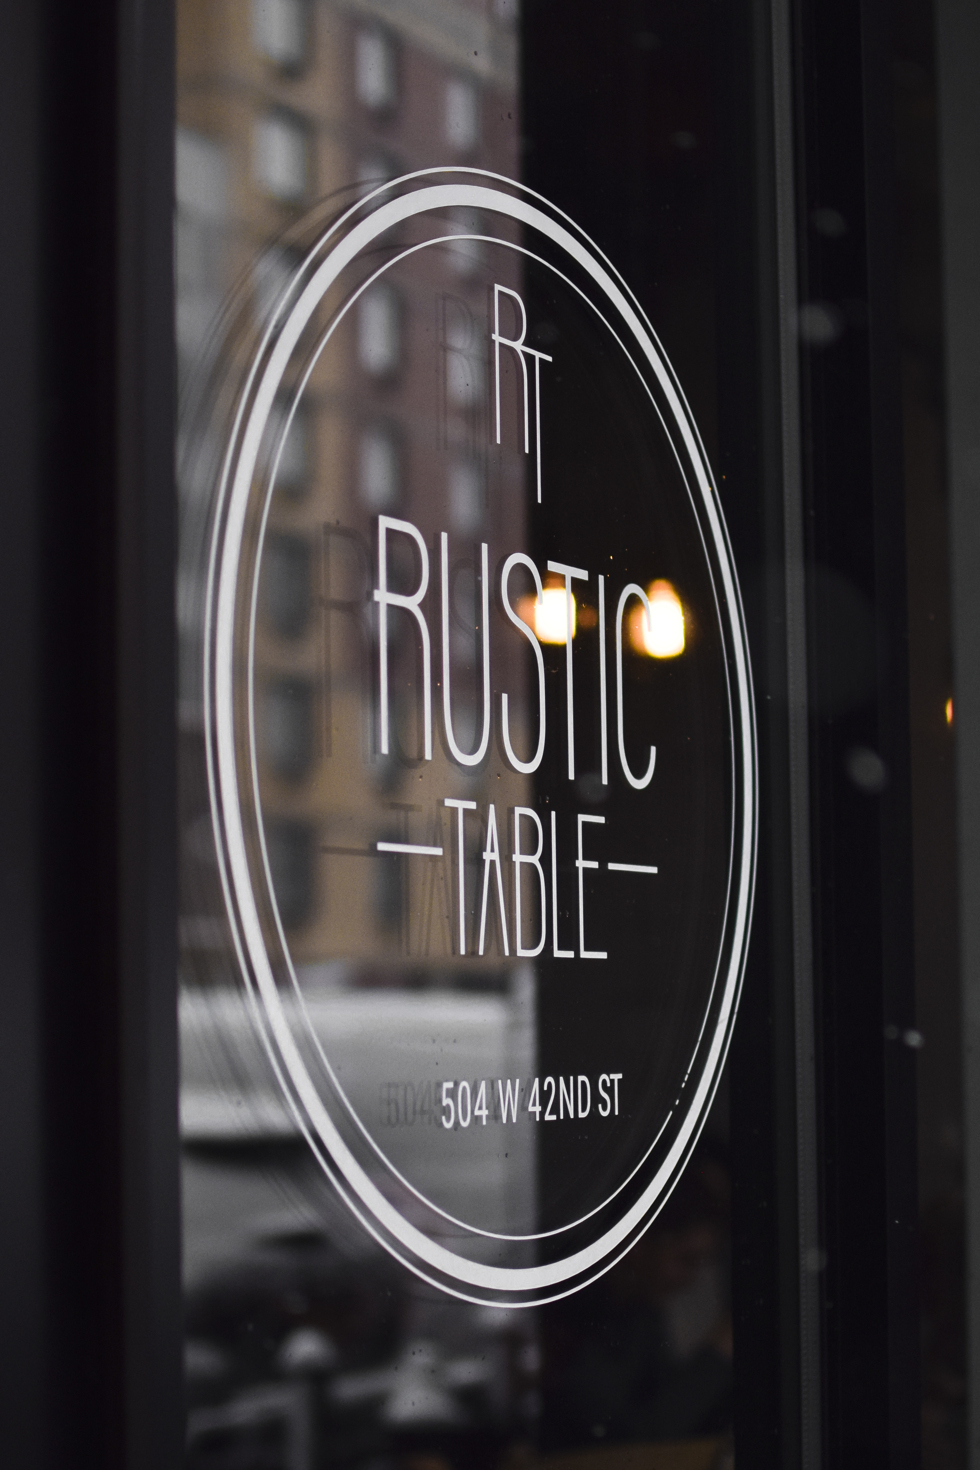 sanne_rustic_table_new_york_8